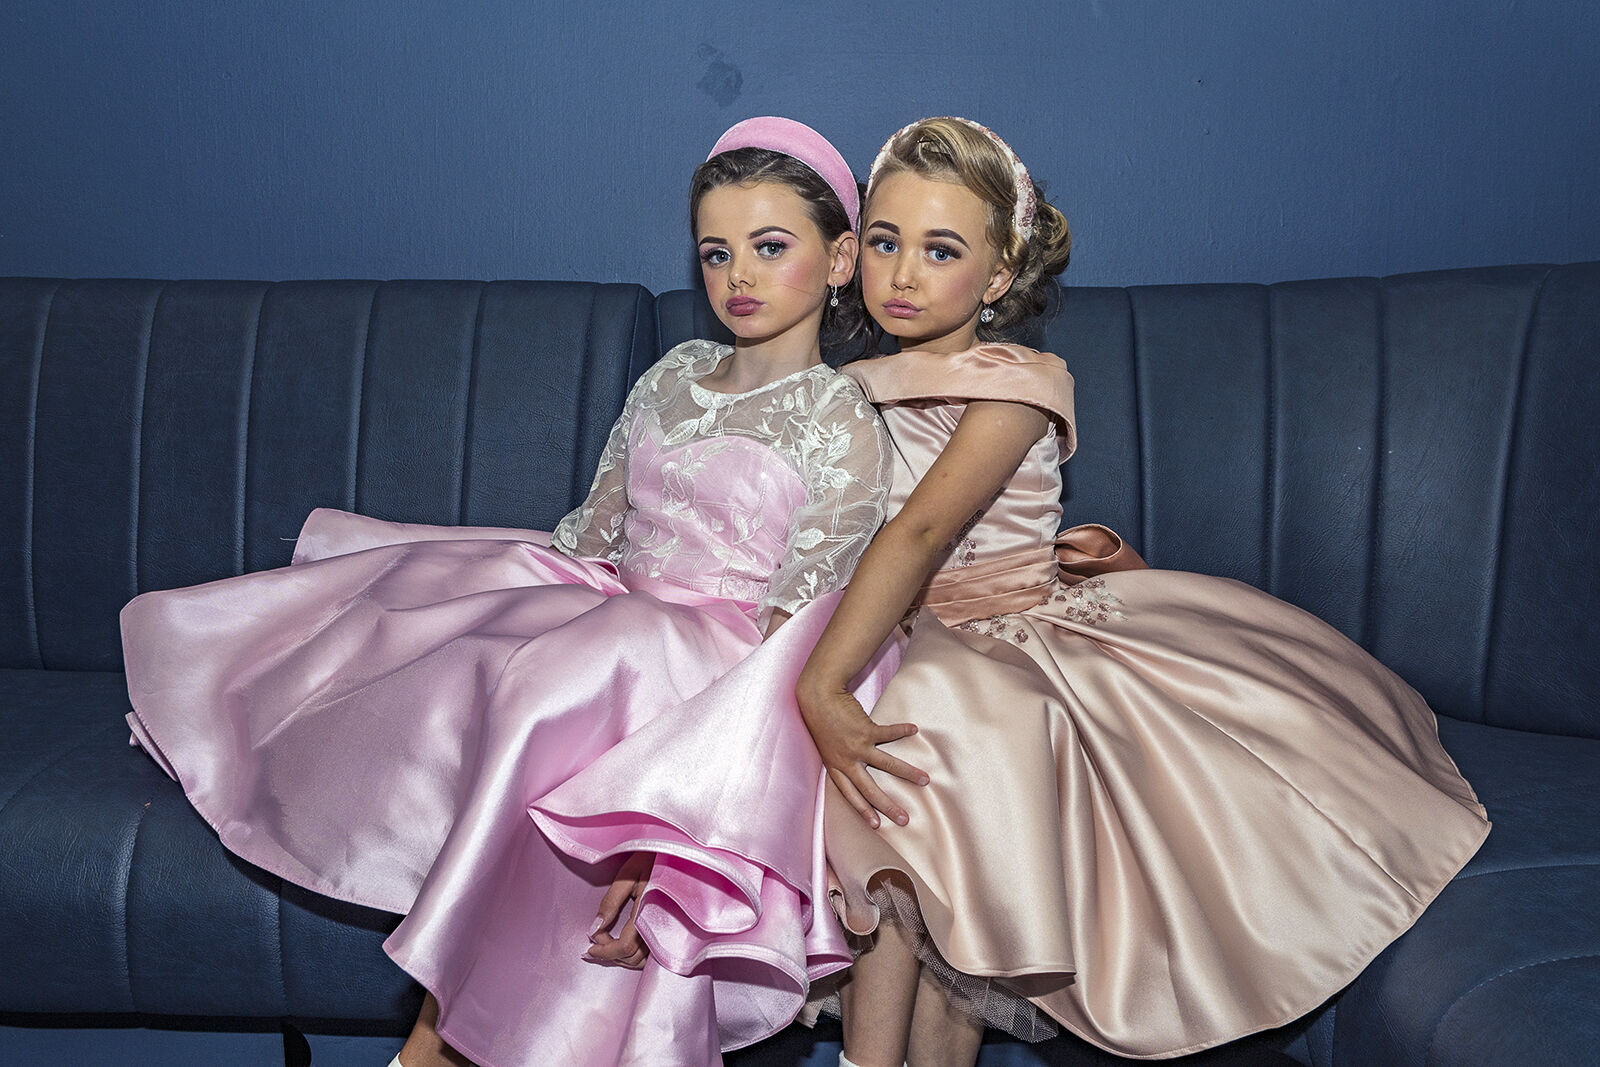 Alesha and Savannah, Dublin, Ireland 2020